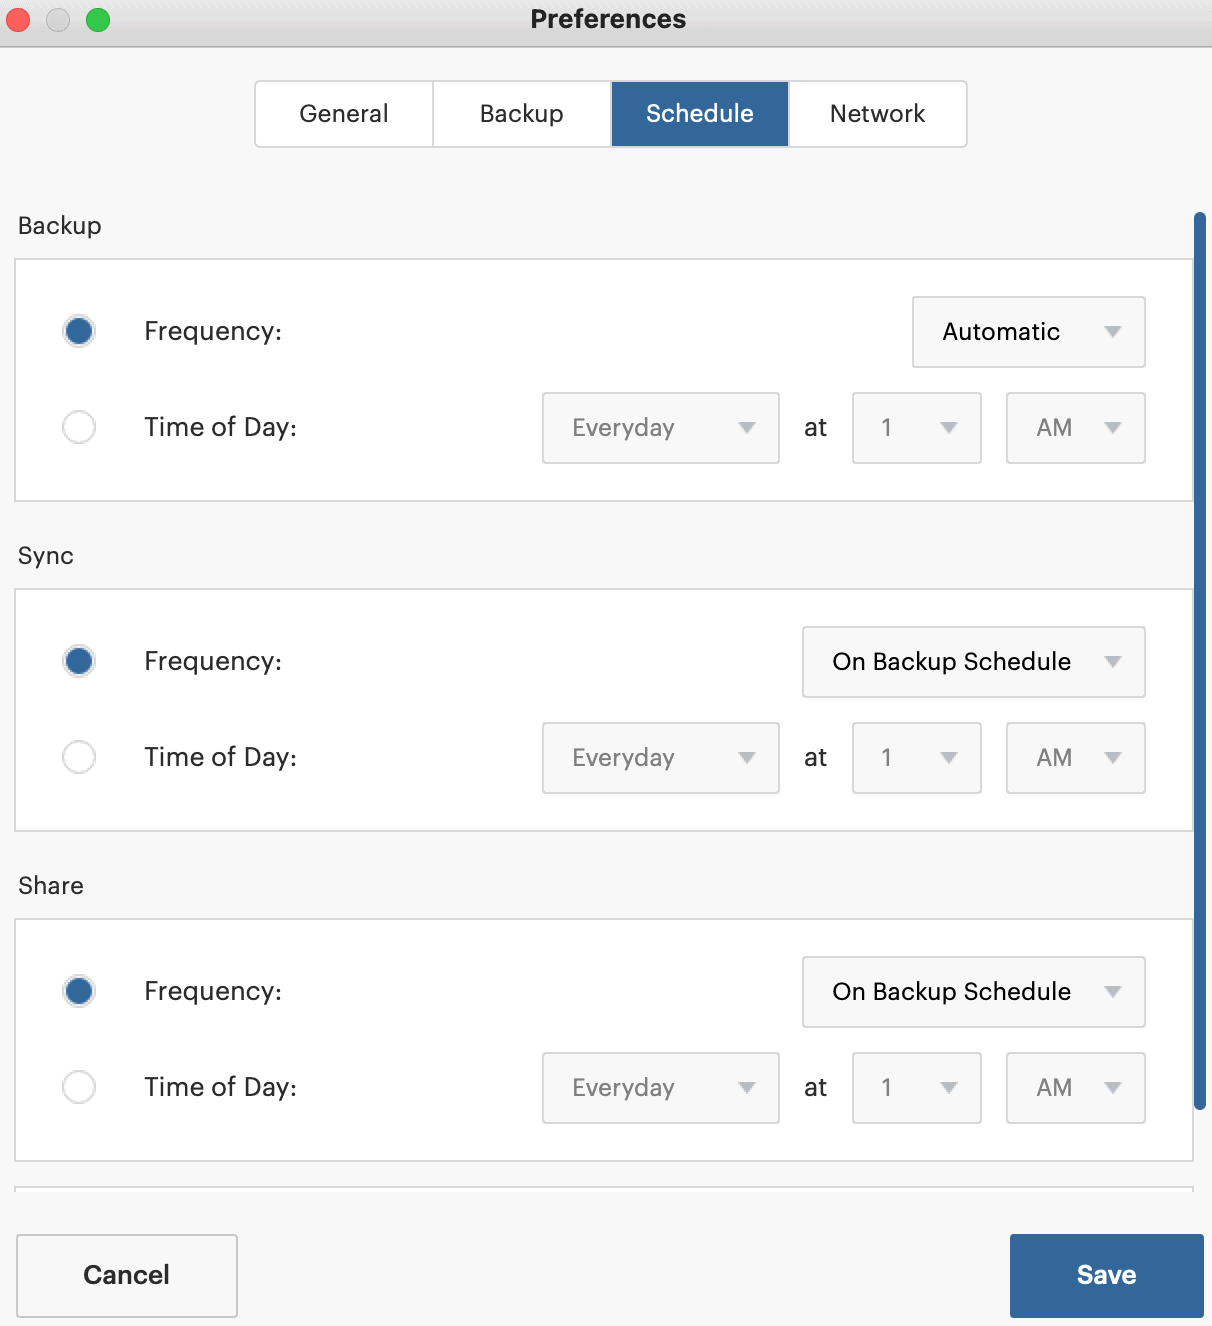 SpiderOak One schedule preferences